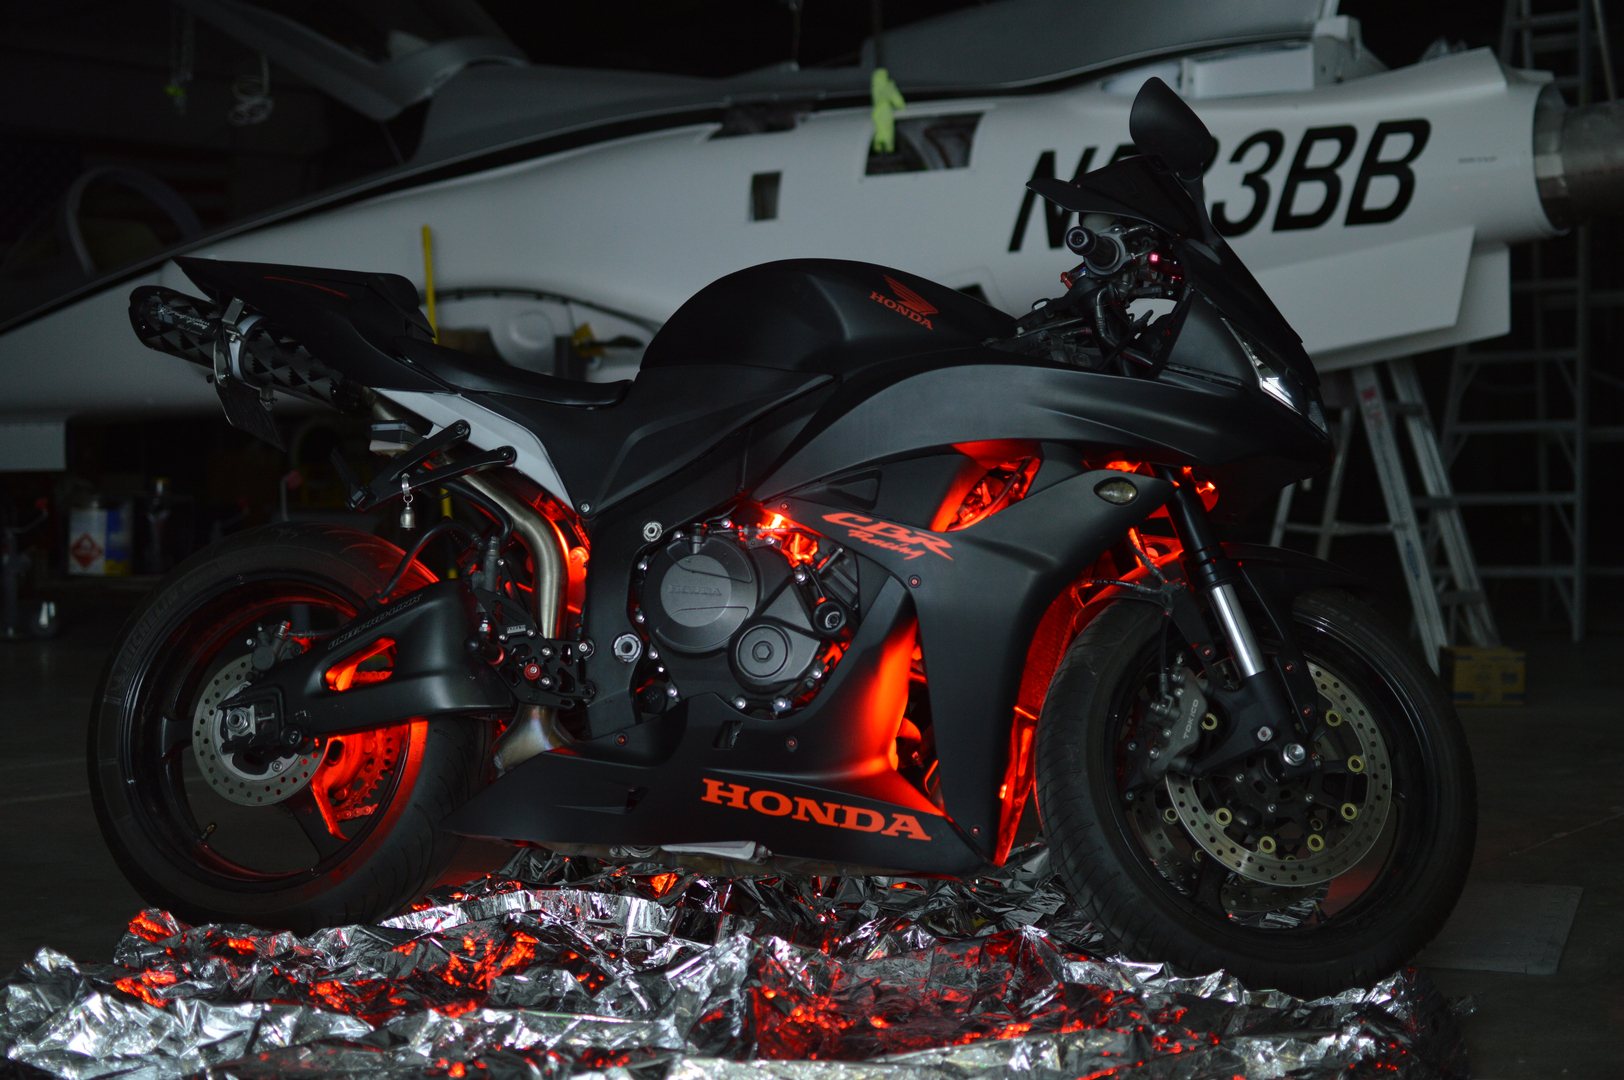 Motorcycle LED Lighting Underglow - PureLEDKit